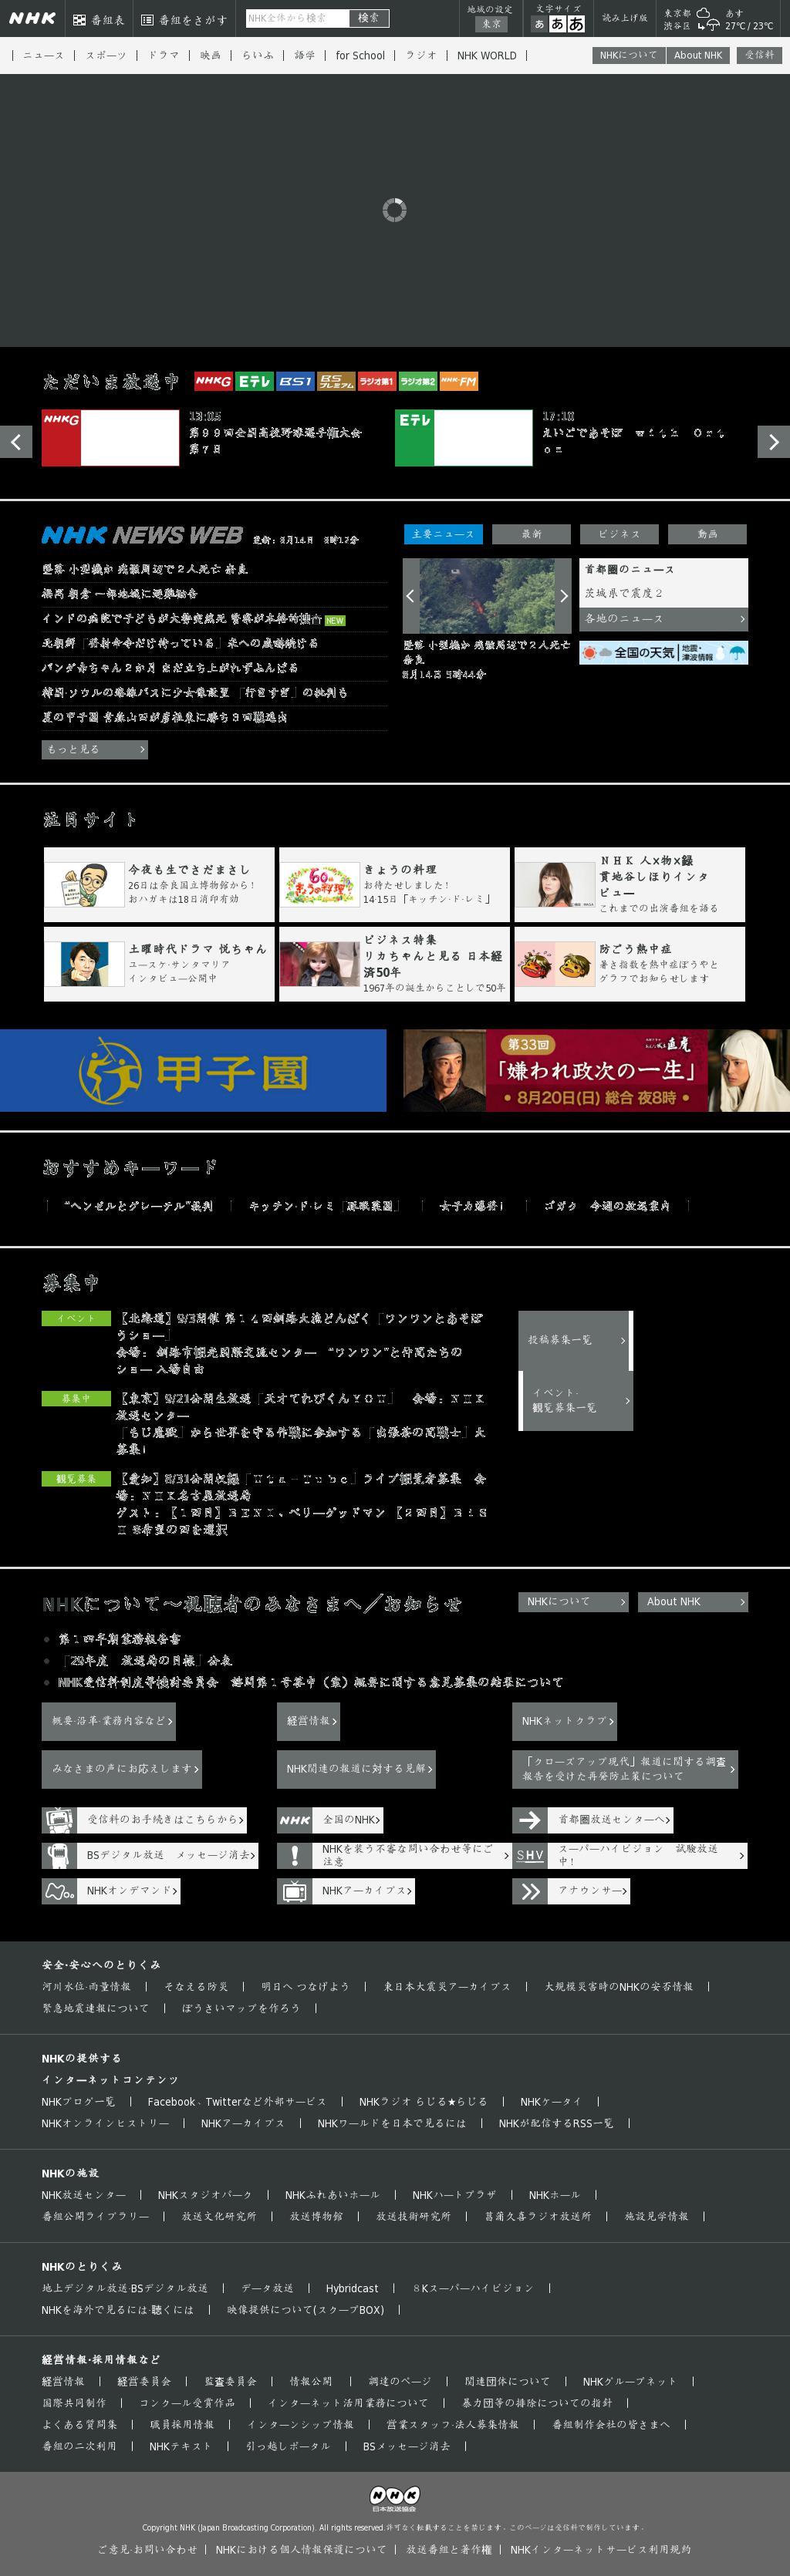 NHK Online at Monday Aug. 14, 2017, 8:13 a.m. UTC